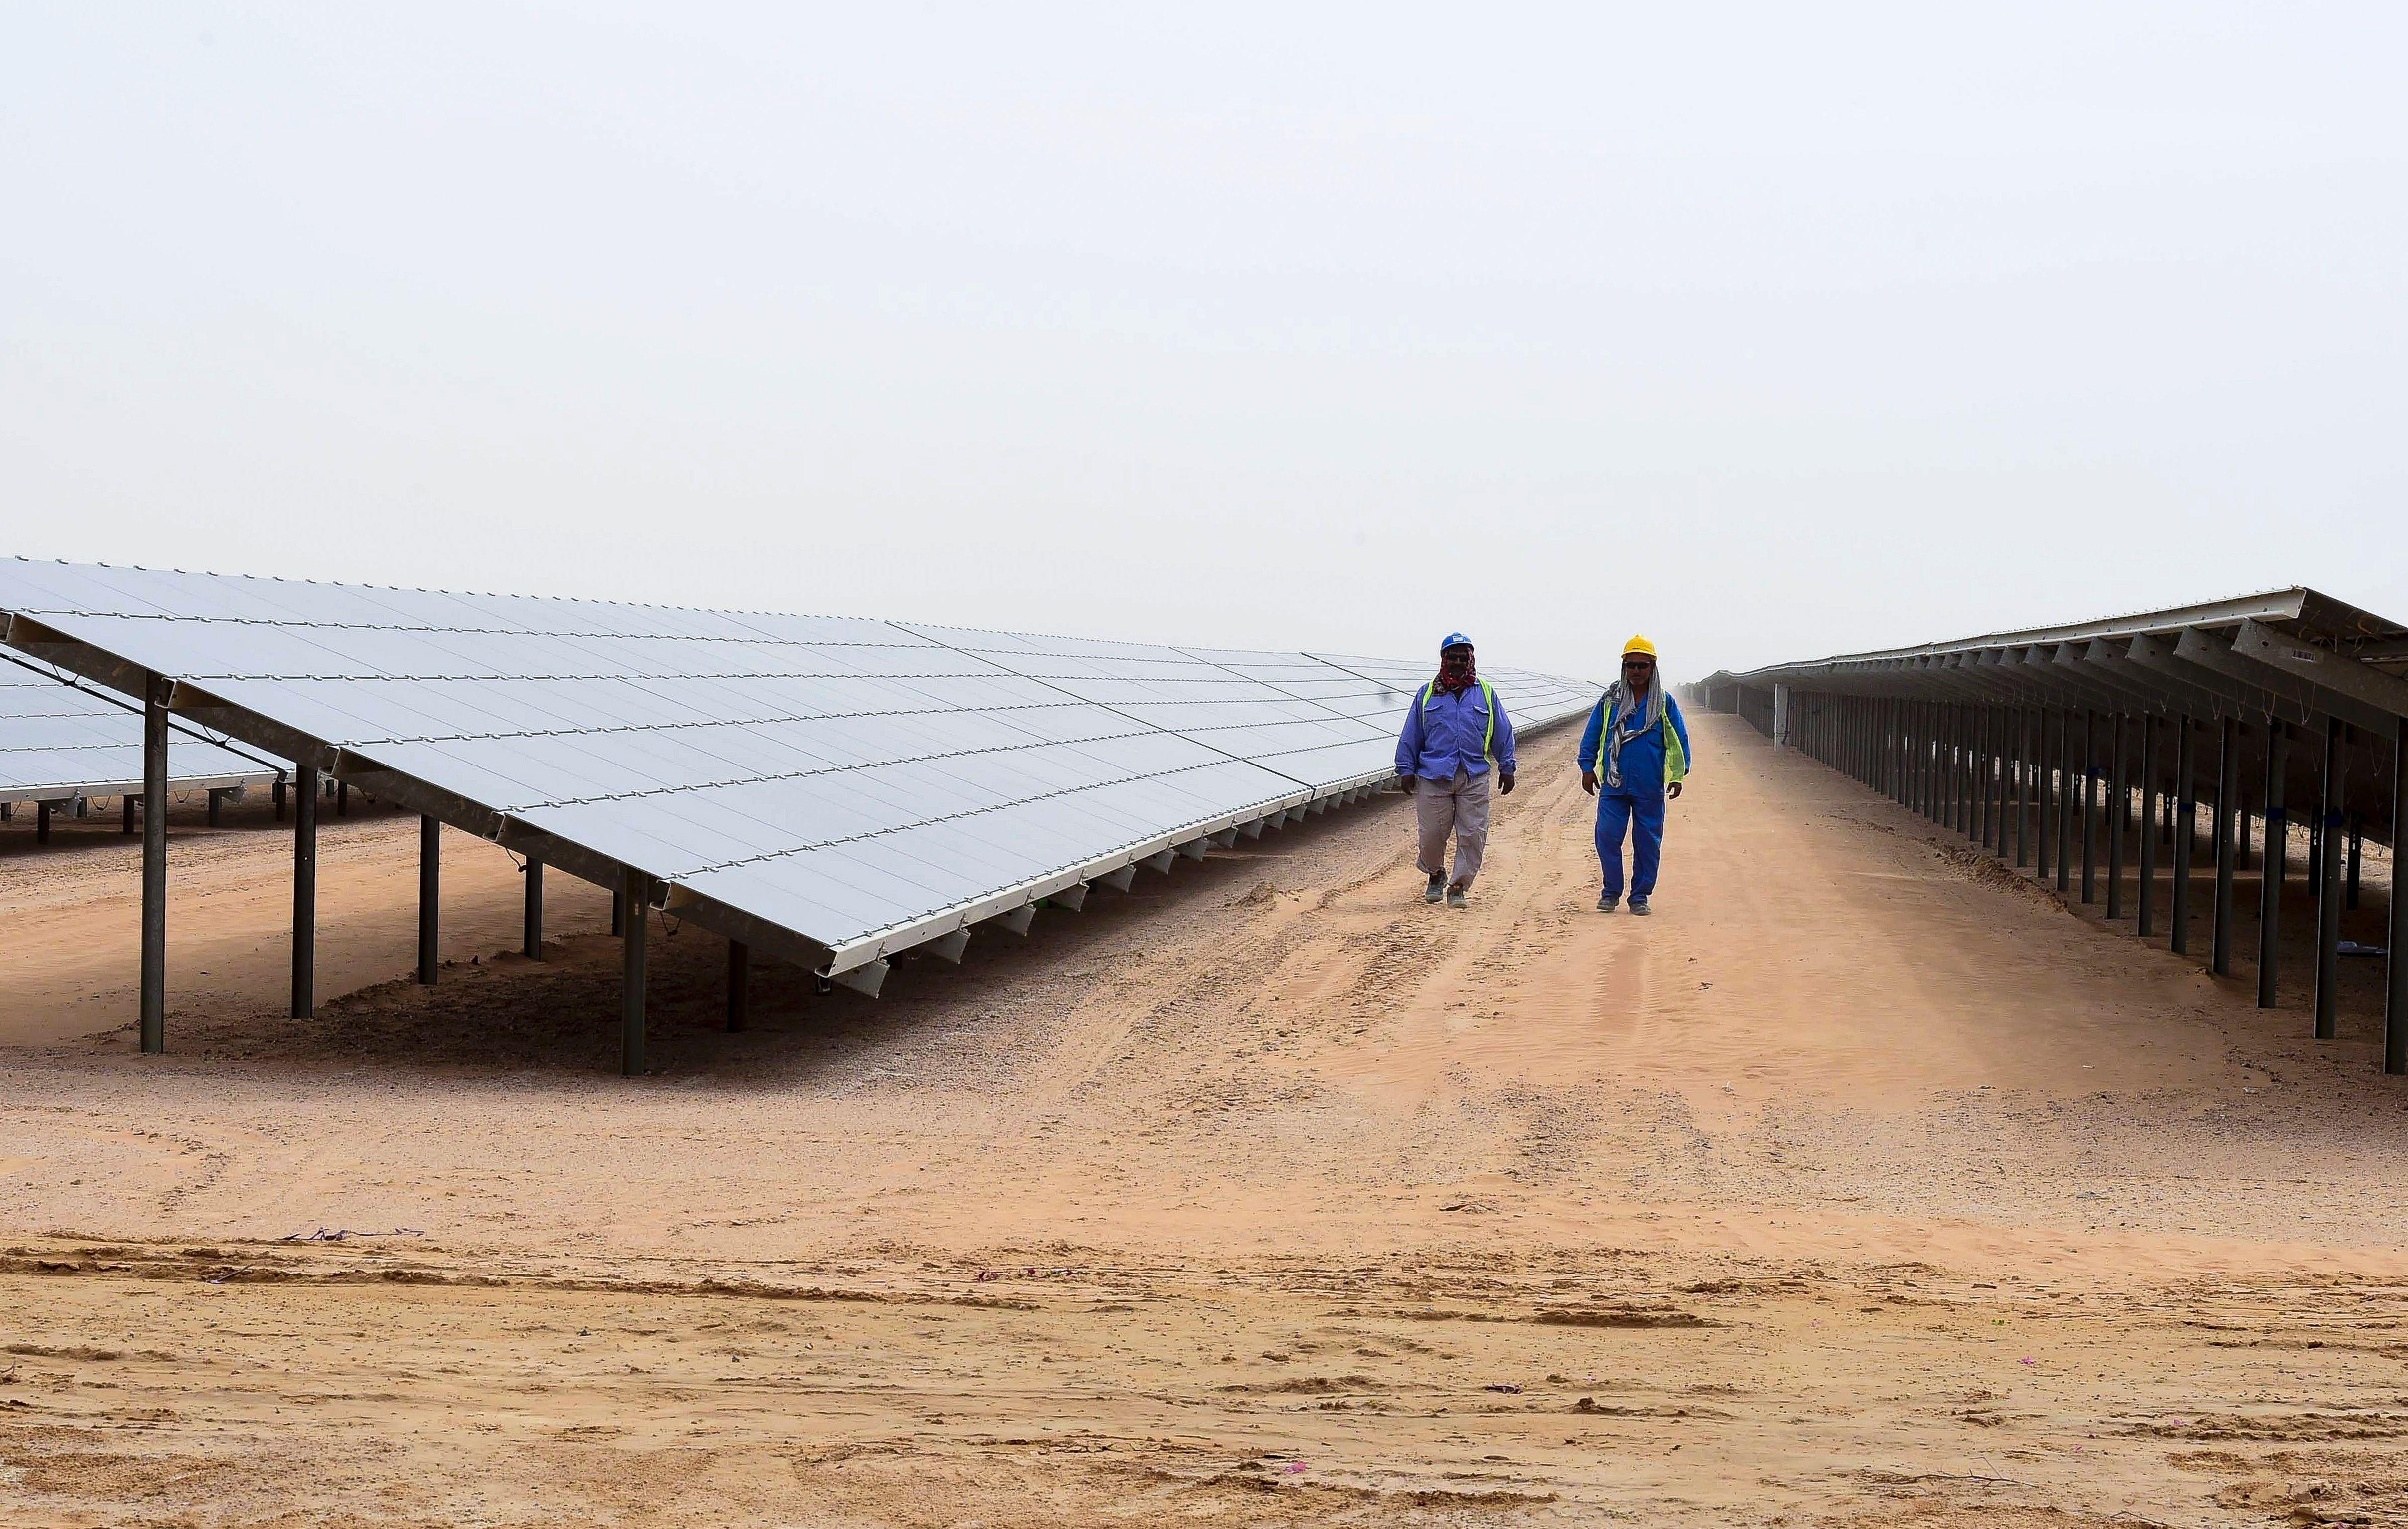 Employees walk past solar panels at the Mohammed bin Rashid Al-Maktoum Solar Park on March 20, 2017, in Dubai.